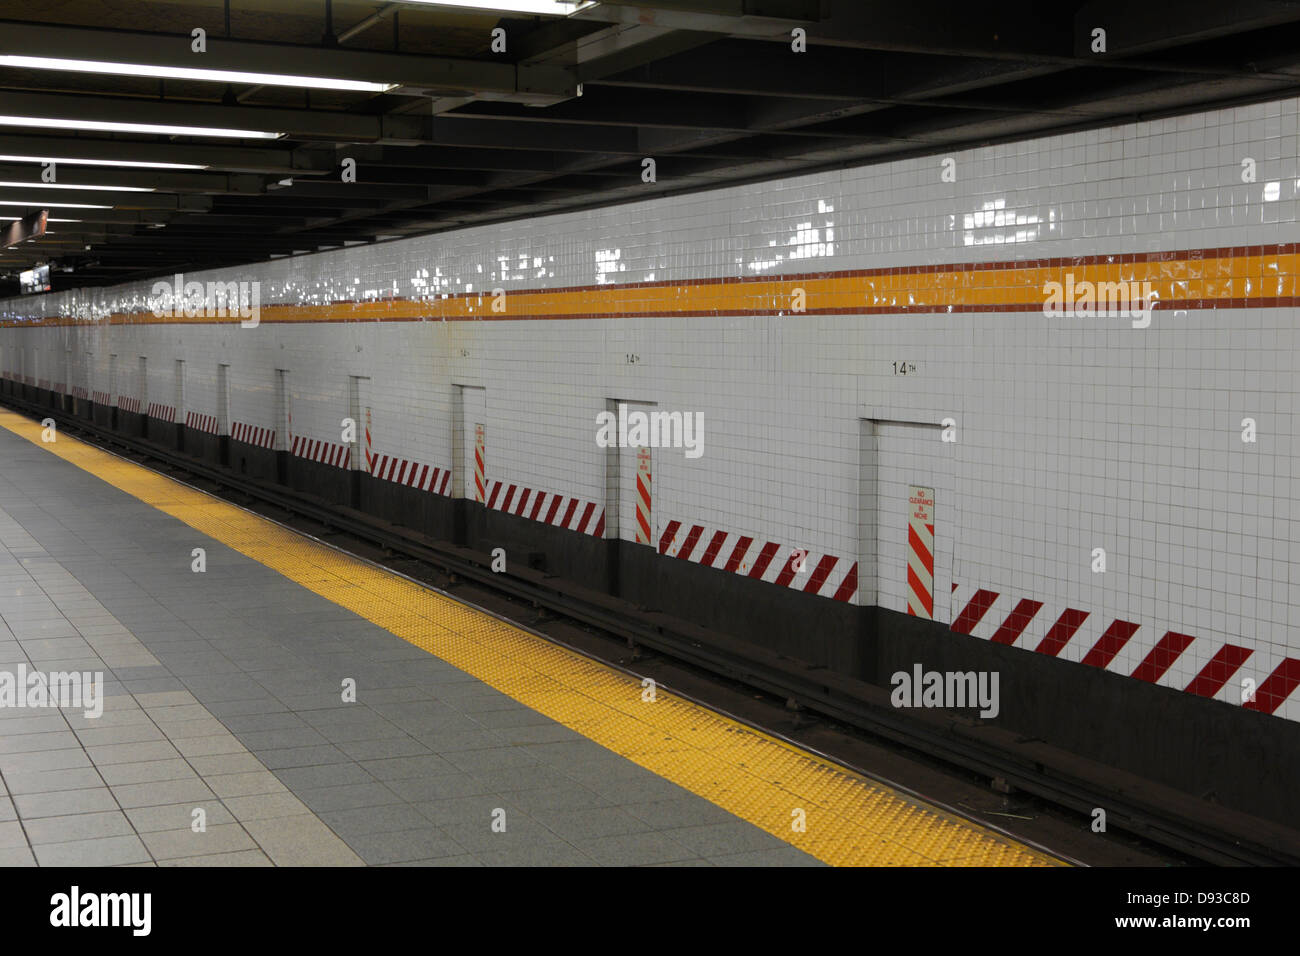 New York Subway Station - Stock Image